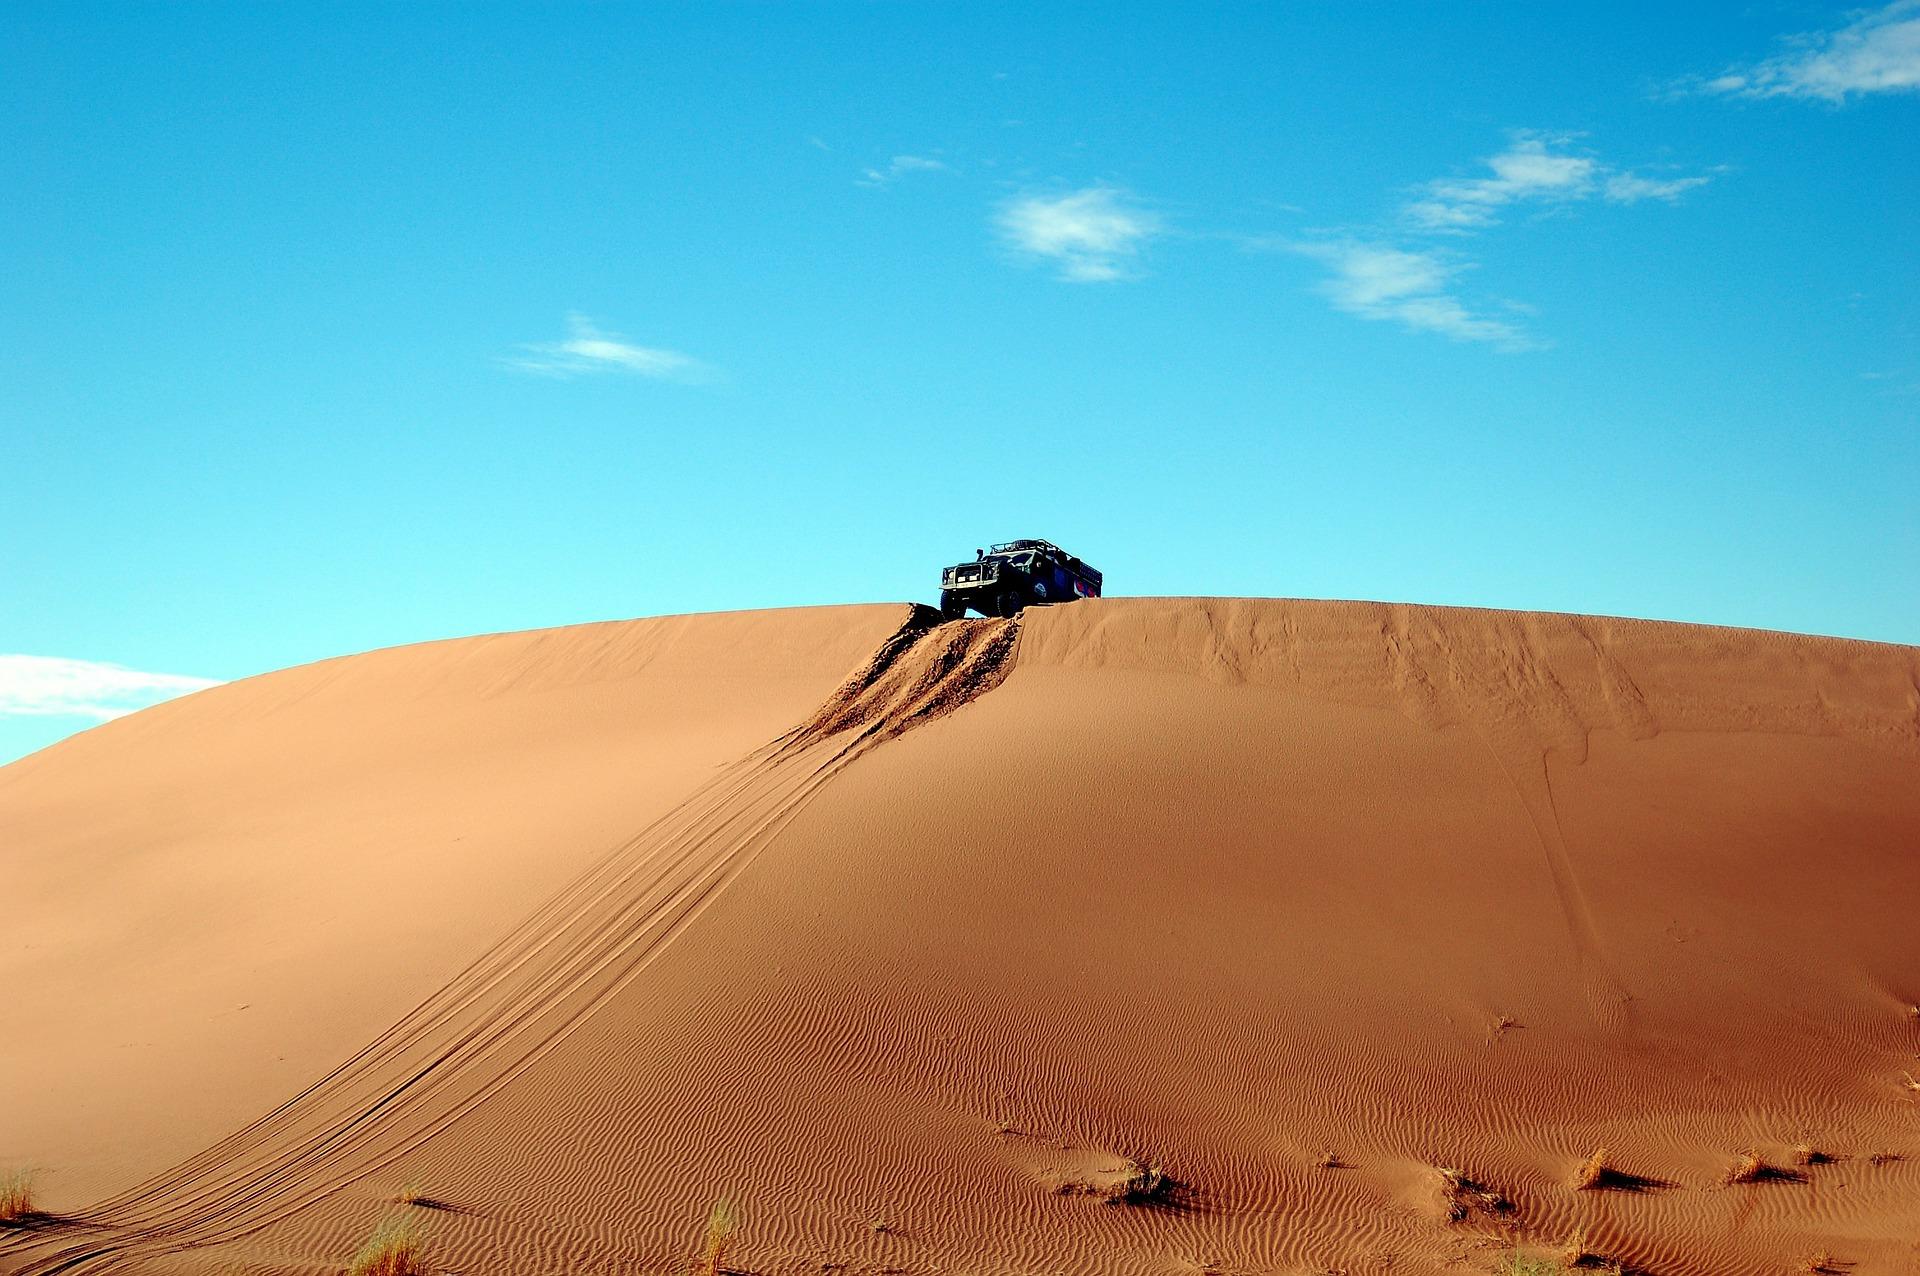 रेगिस्तान, टिब्बा, कारें, रेत, आकाश, जोखिम, ब्लू - HD वॉलपेपर - प्रोफेसर-falken.com